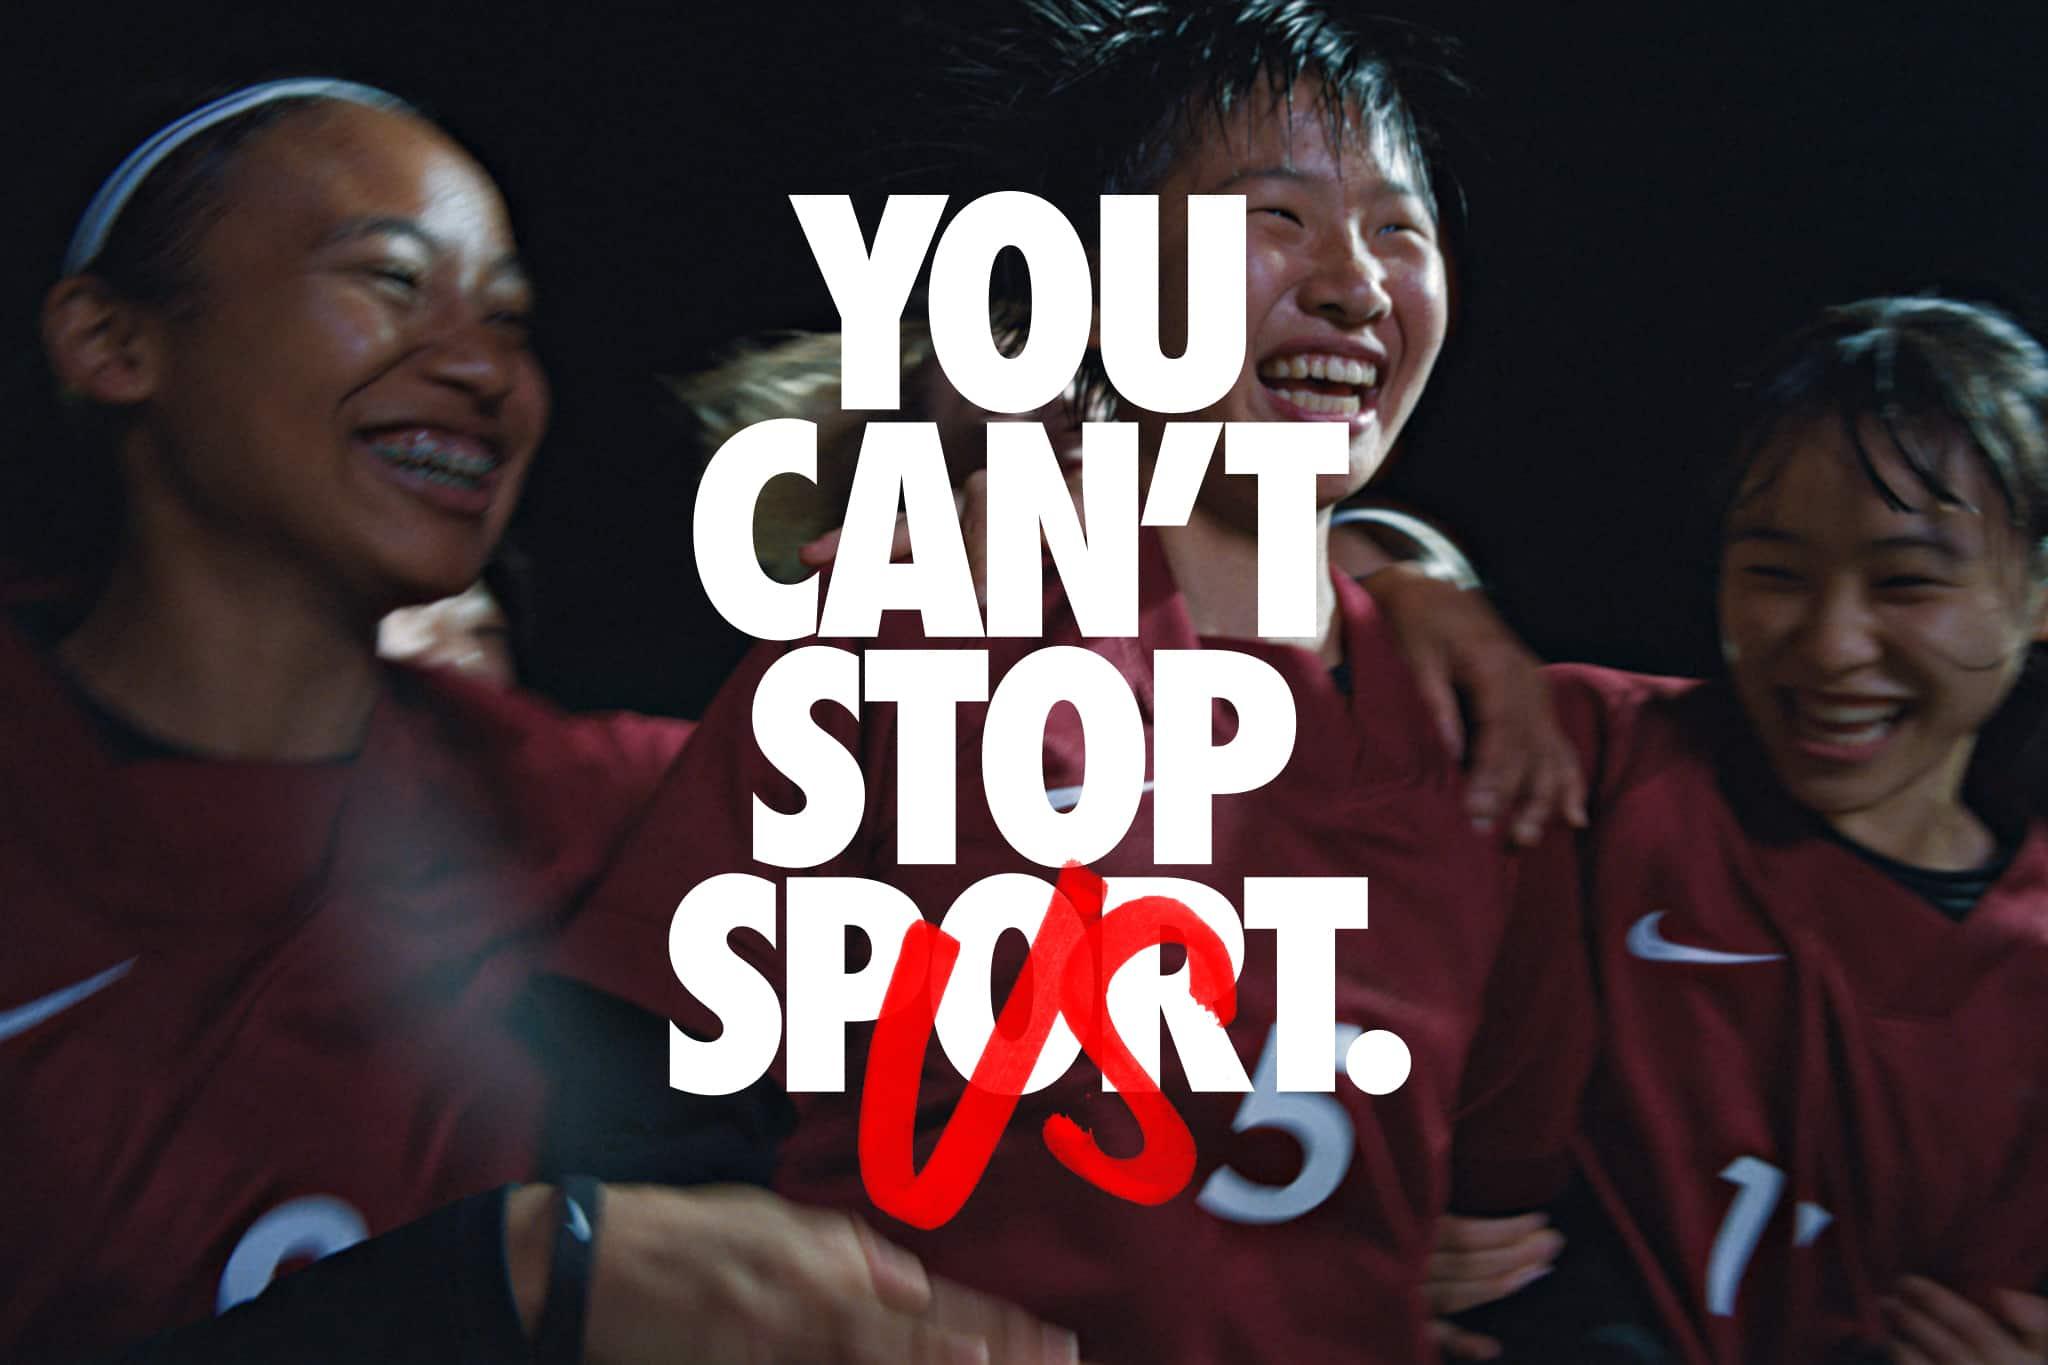 Spot Nike - The future isnt waiting